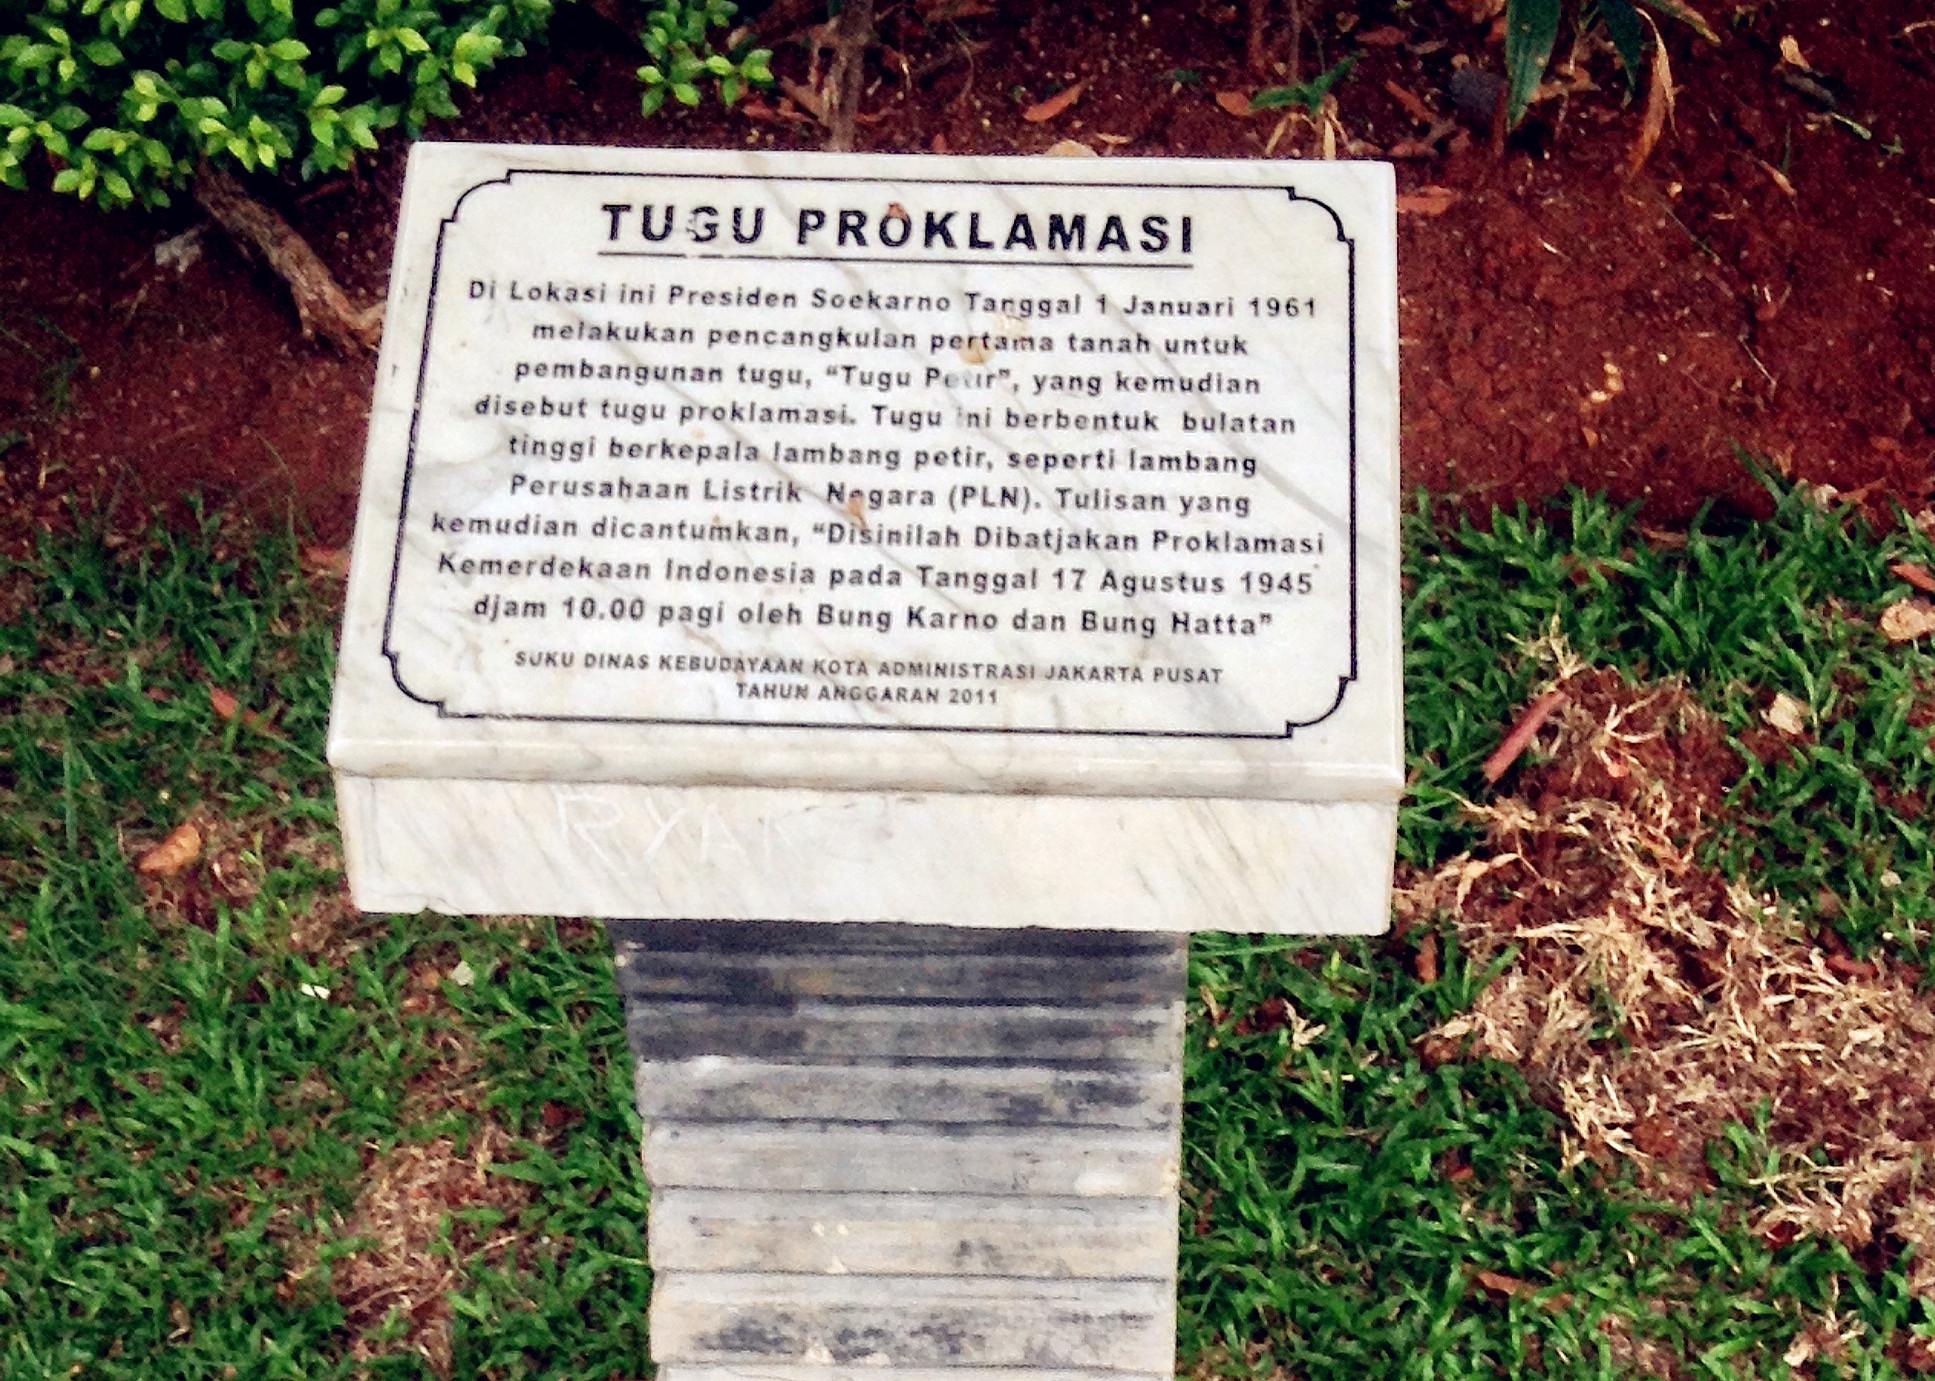 Writer Cindy Nadhifa Jakarta Yuk Lapangan Dikelilingi Taman Dilengkapi Bangku